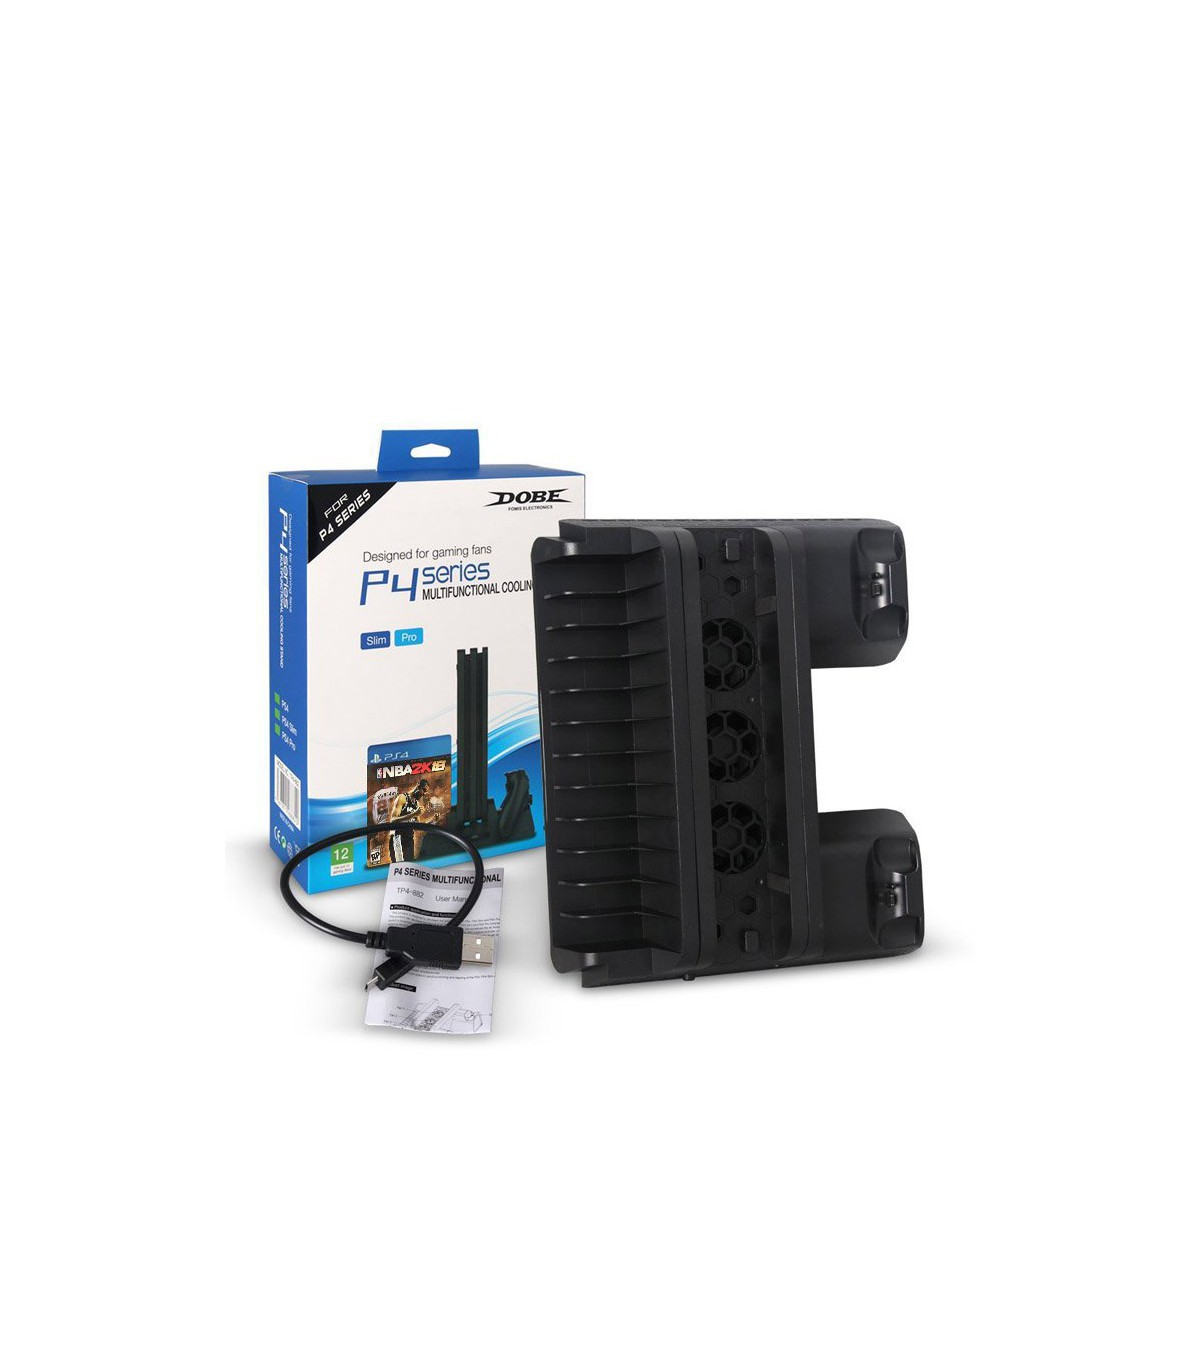 پایه چندکاره پلی استیشن Multifunctional Cooler Stand